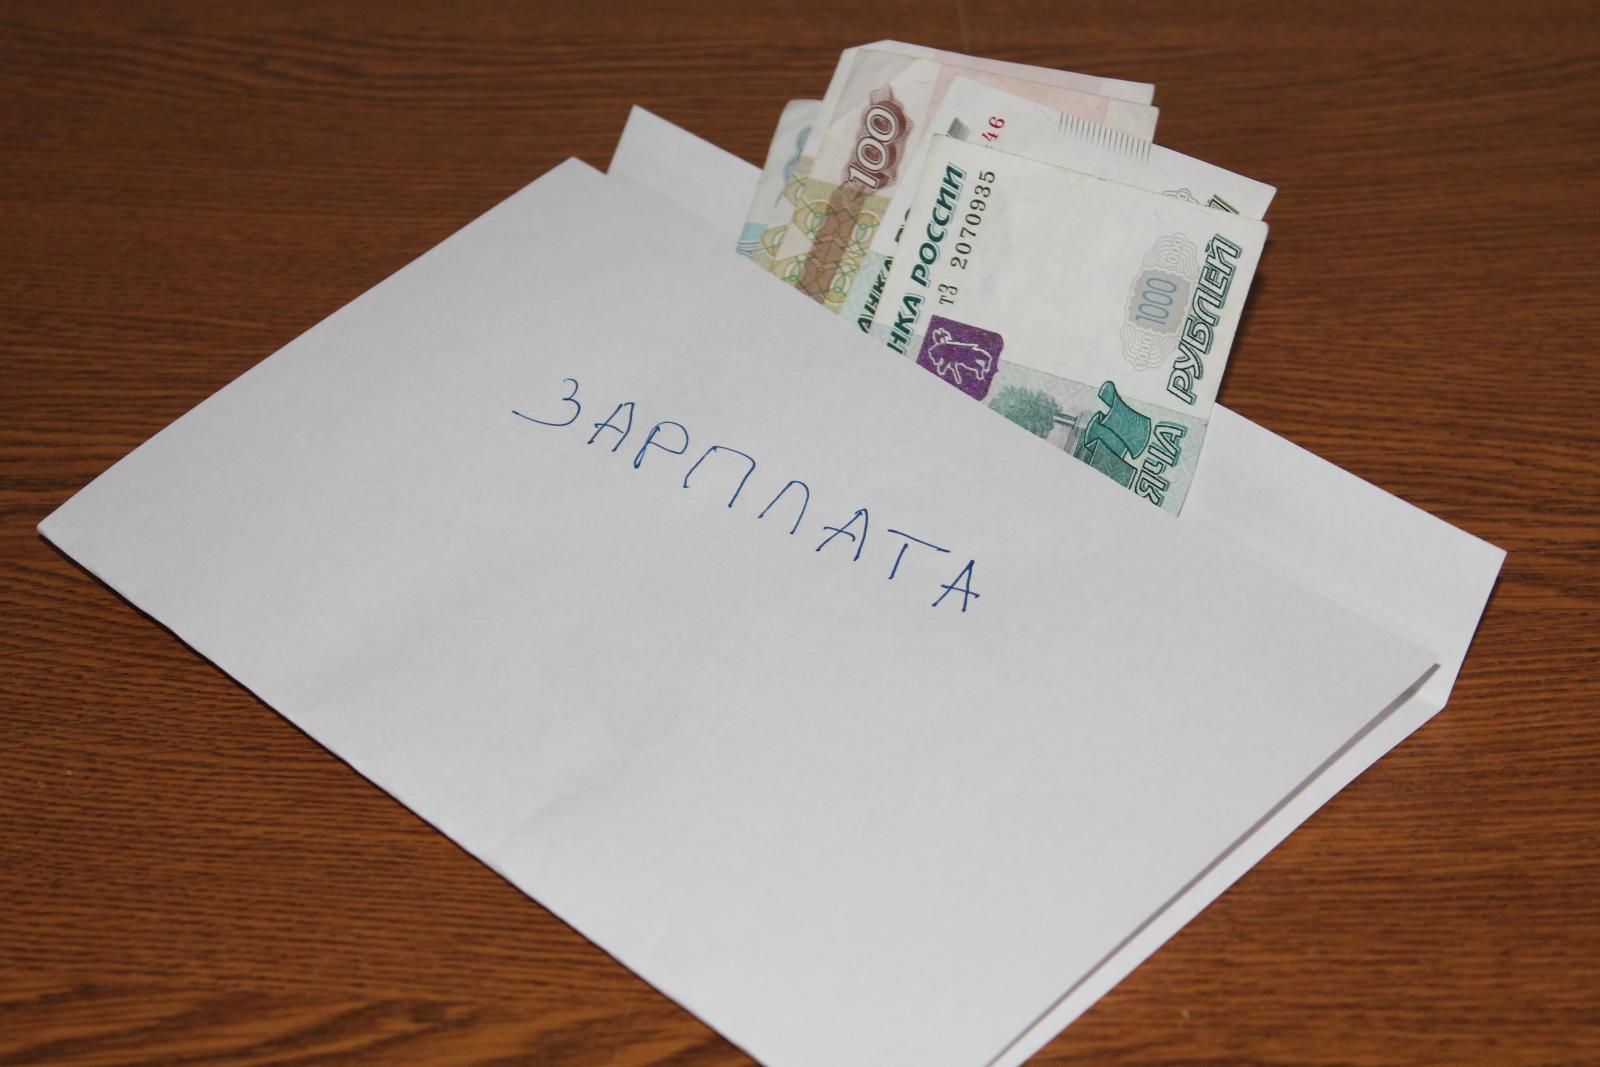 Предприятие «БрянскСтройПроект» задолжало работникам 2,8 млн рублей